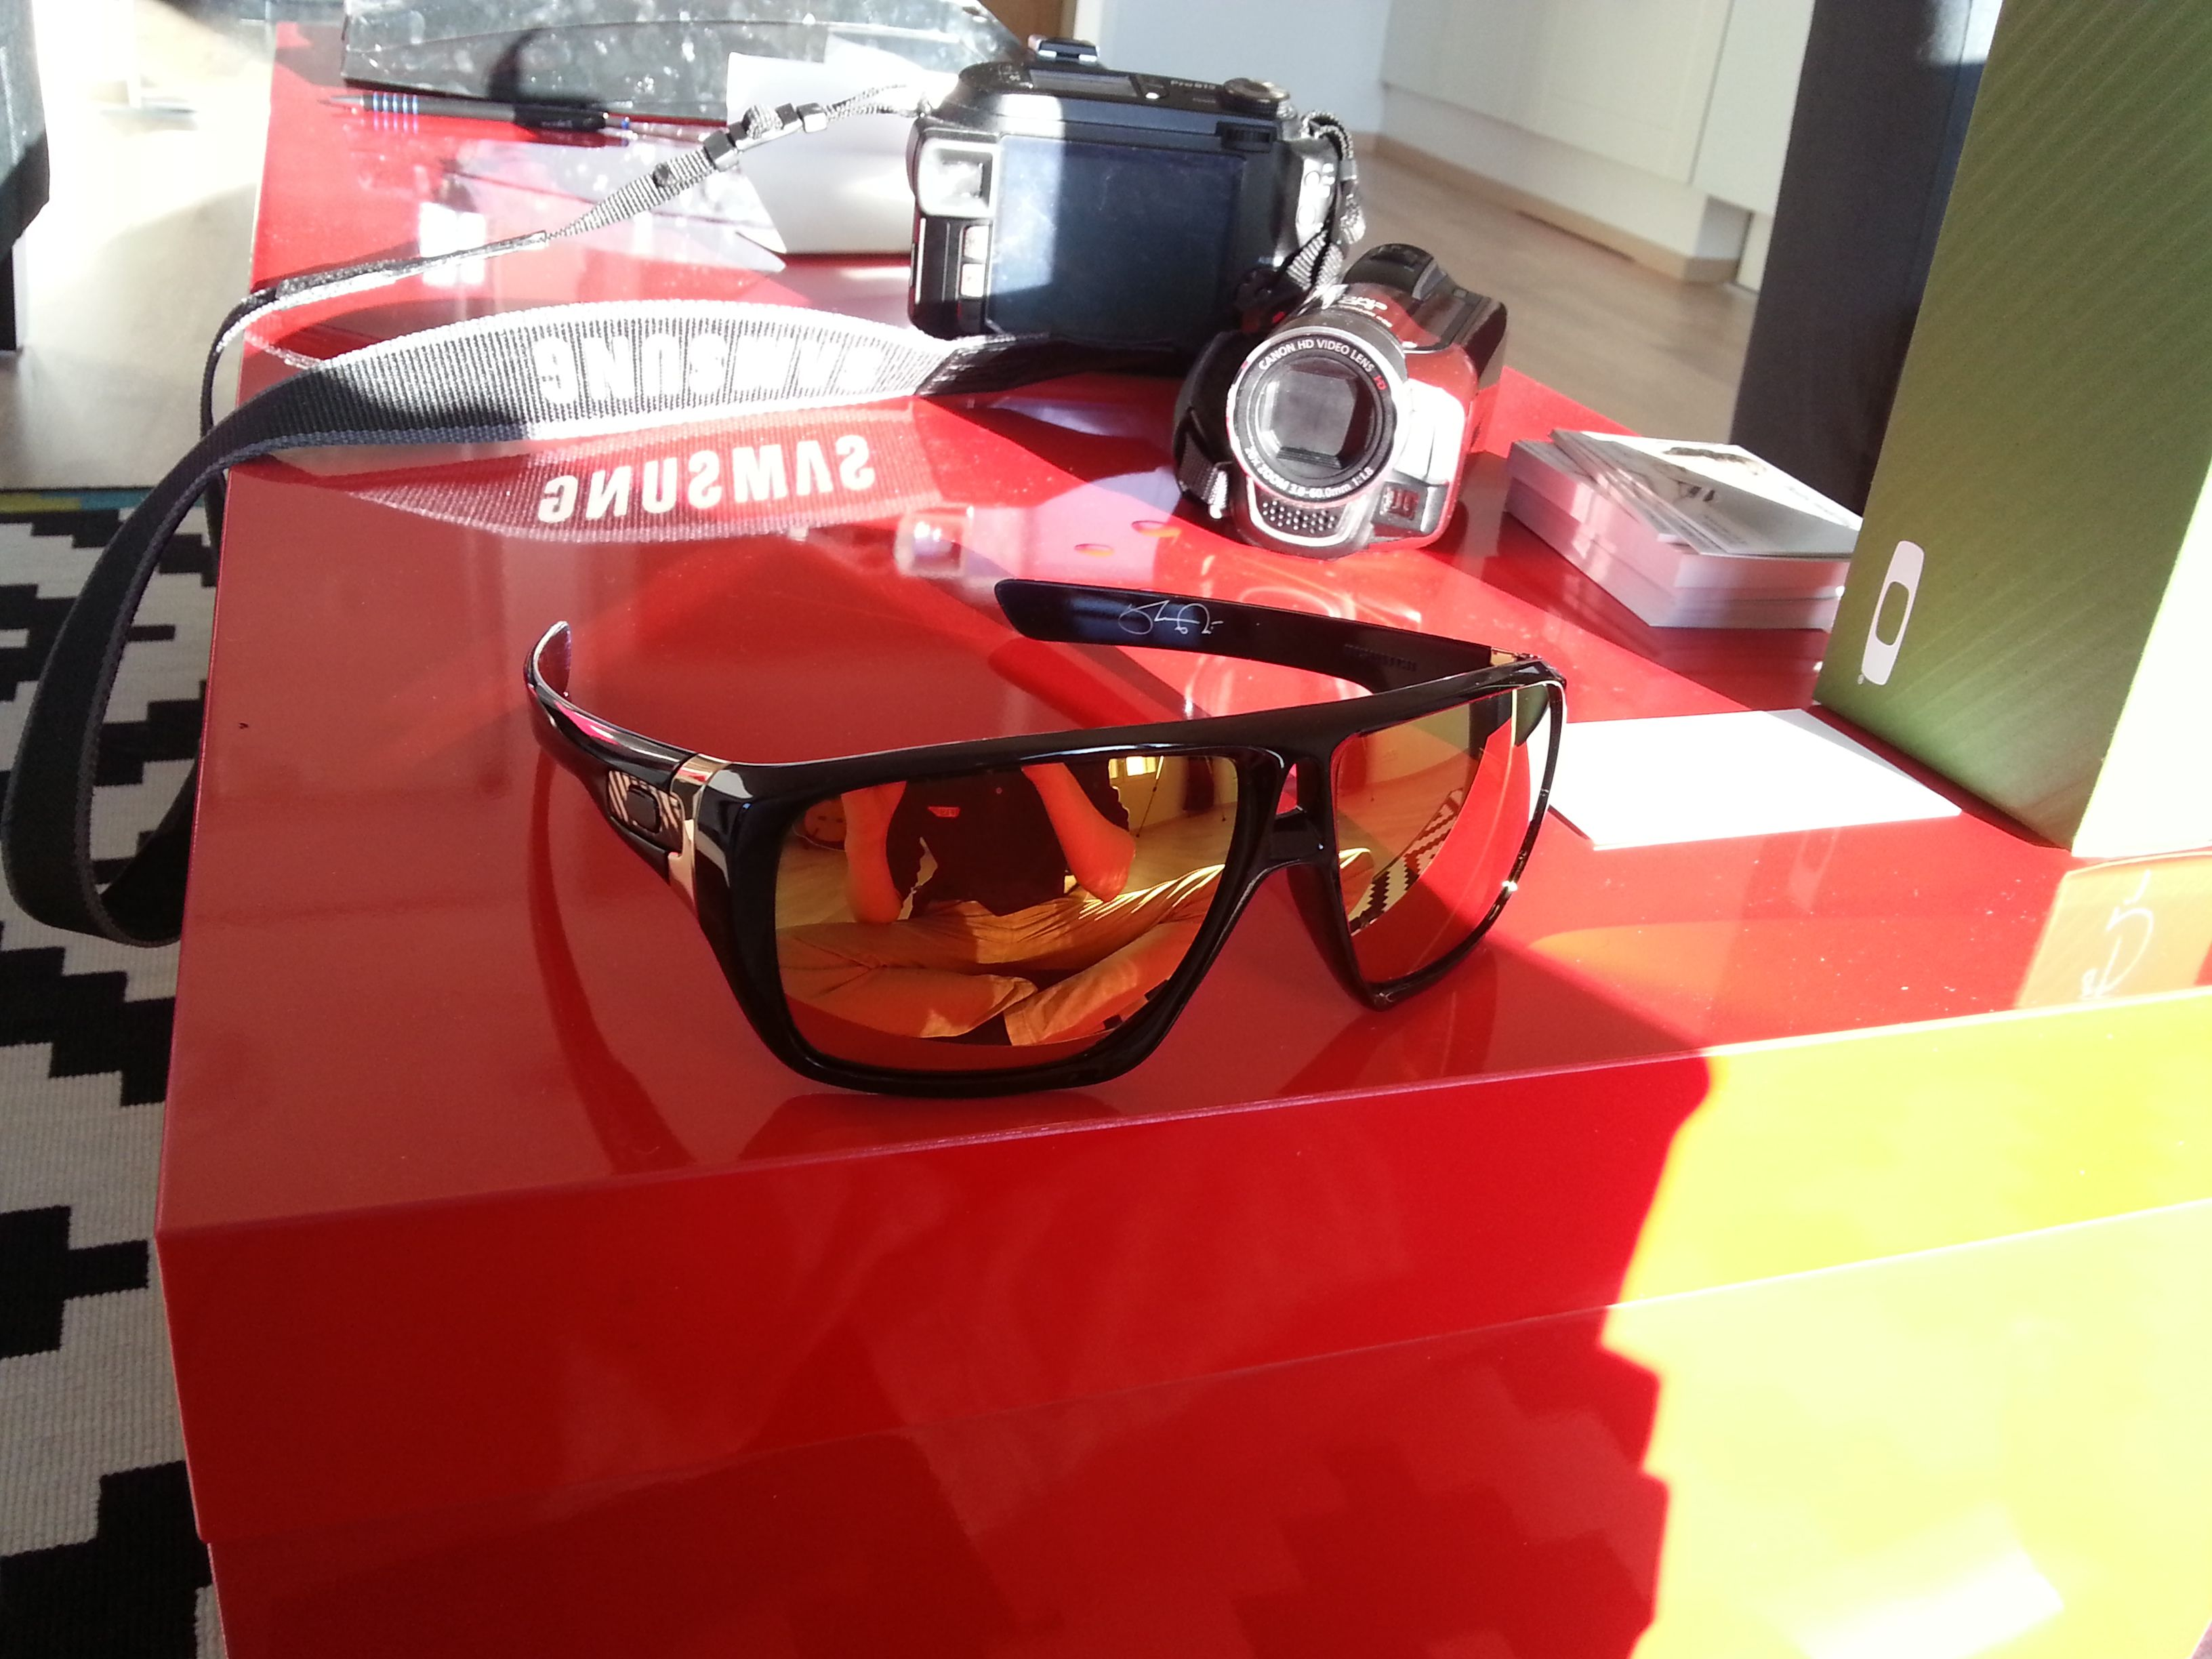 4c0ef1e59f6f8 ... cheapest oakley dispatch sunglasses oakley dispatch sunglasses glasses  shades shaun white signature youtube mairoutv black limited 50% off ...